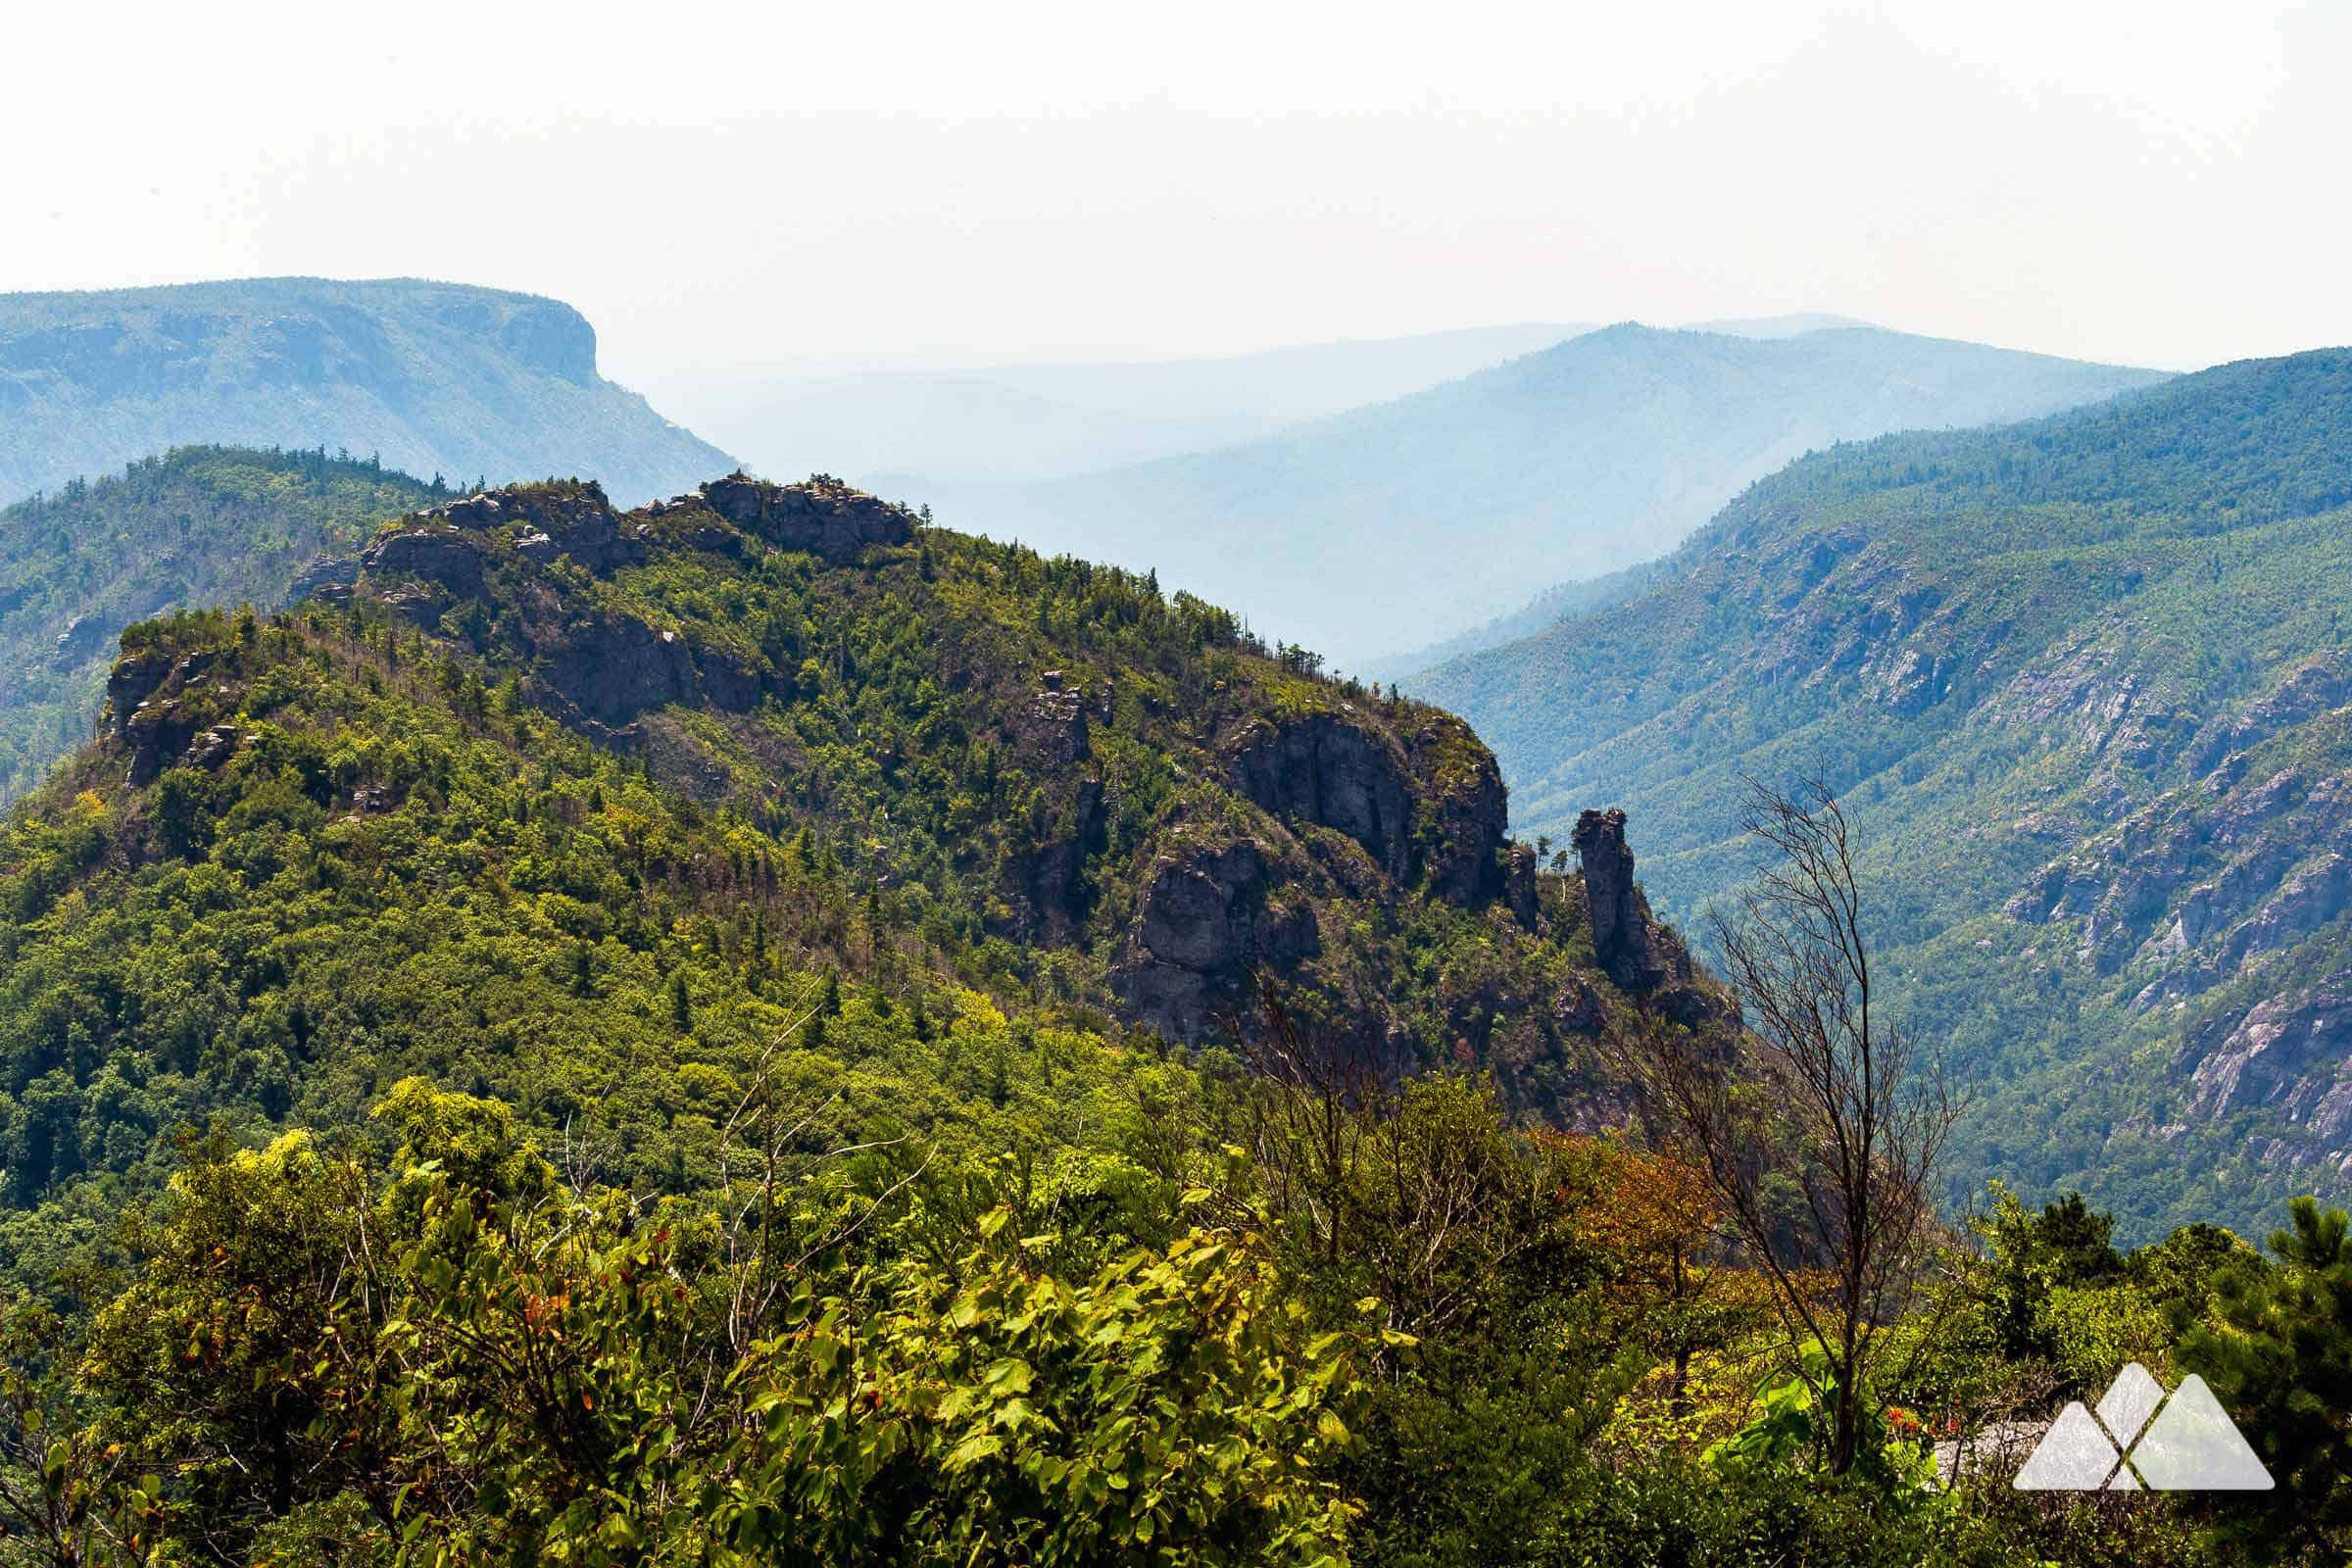 Best Weekend Backpacking Trips In North Carolina